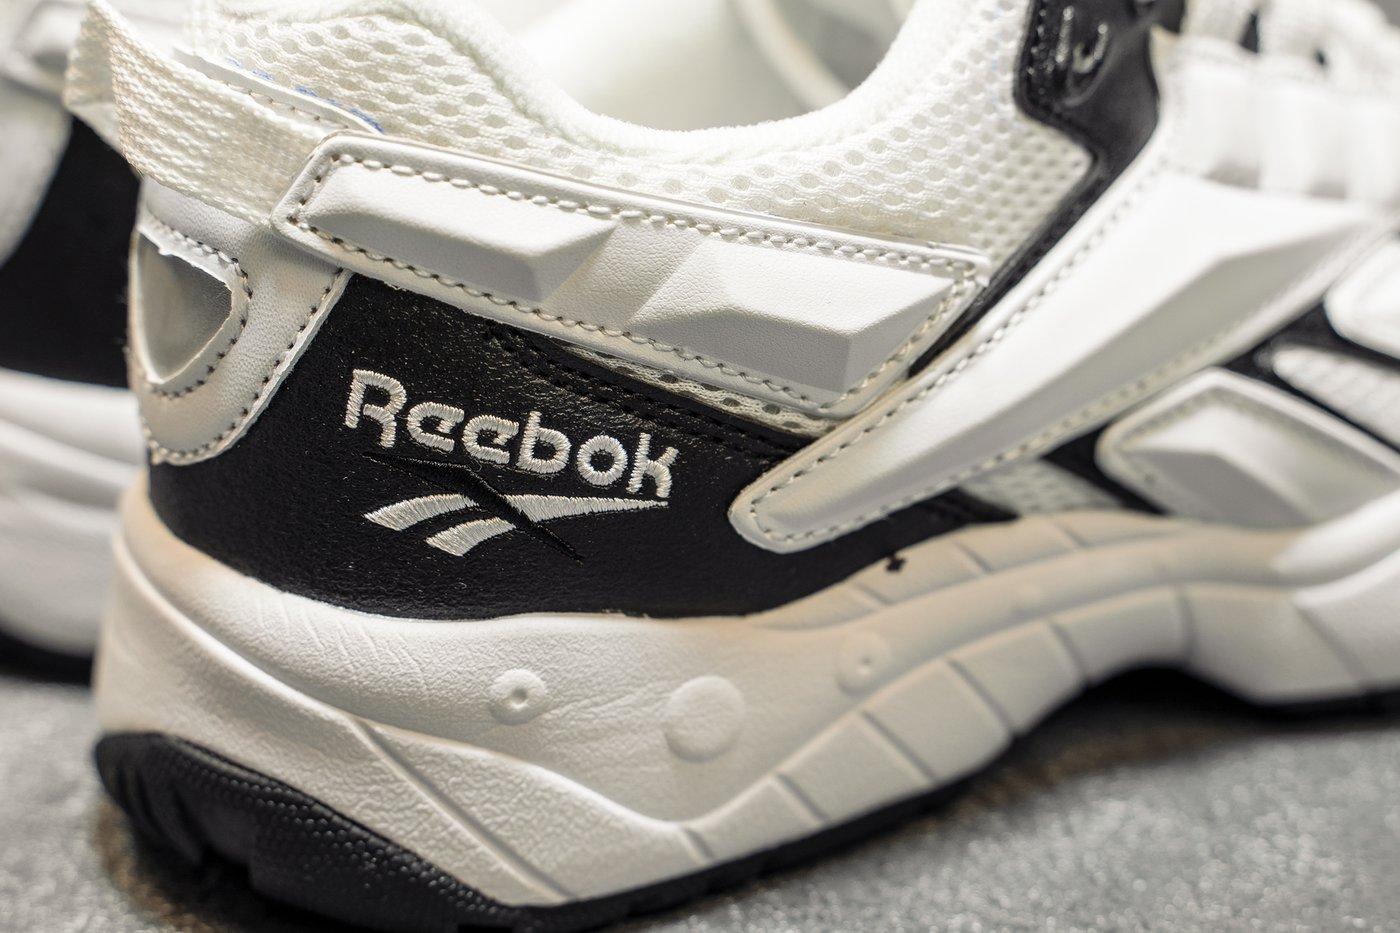 Adidas намерена продать бренд Reebok?